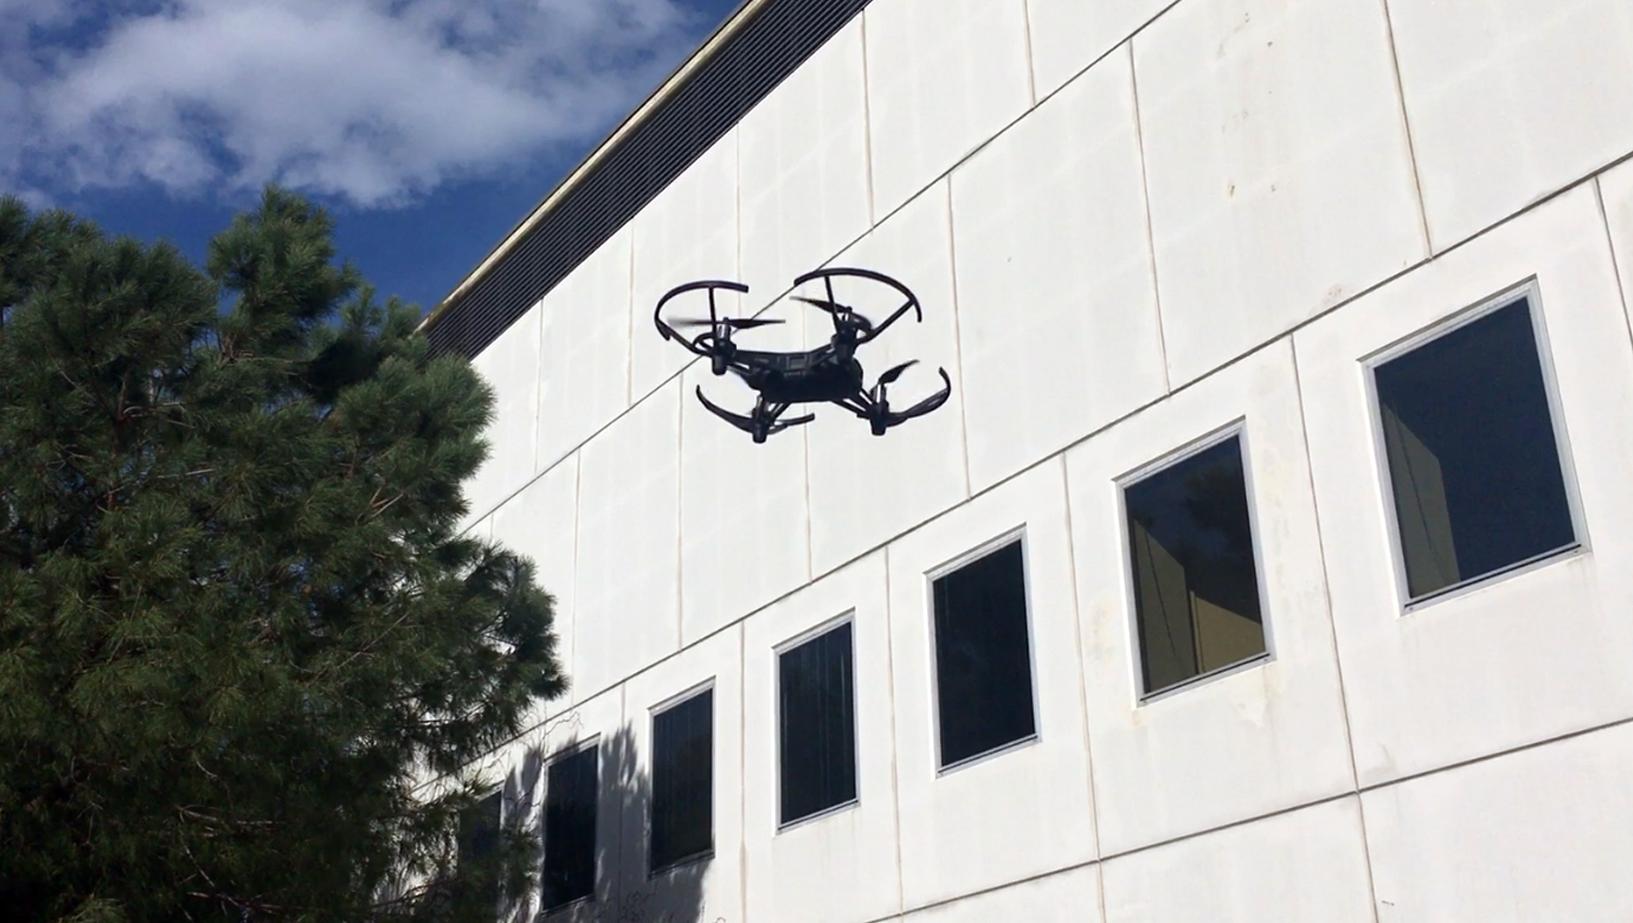 Drone tello volando exterior